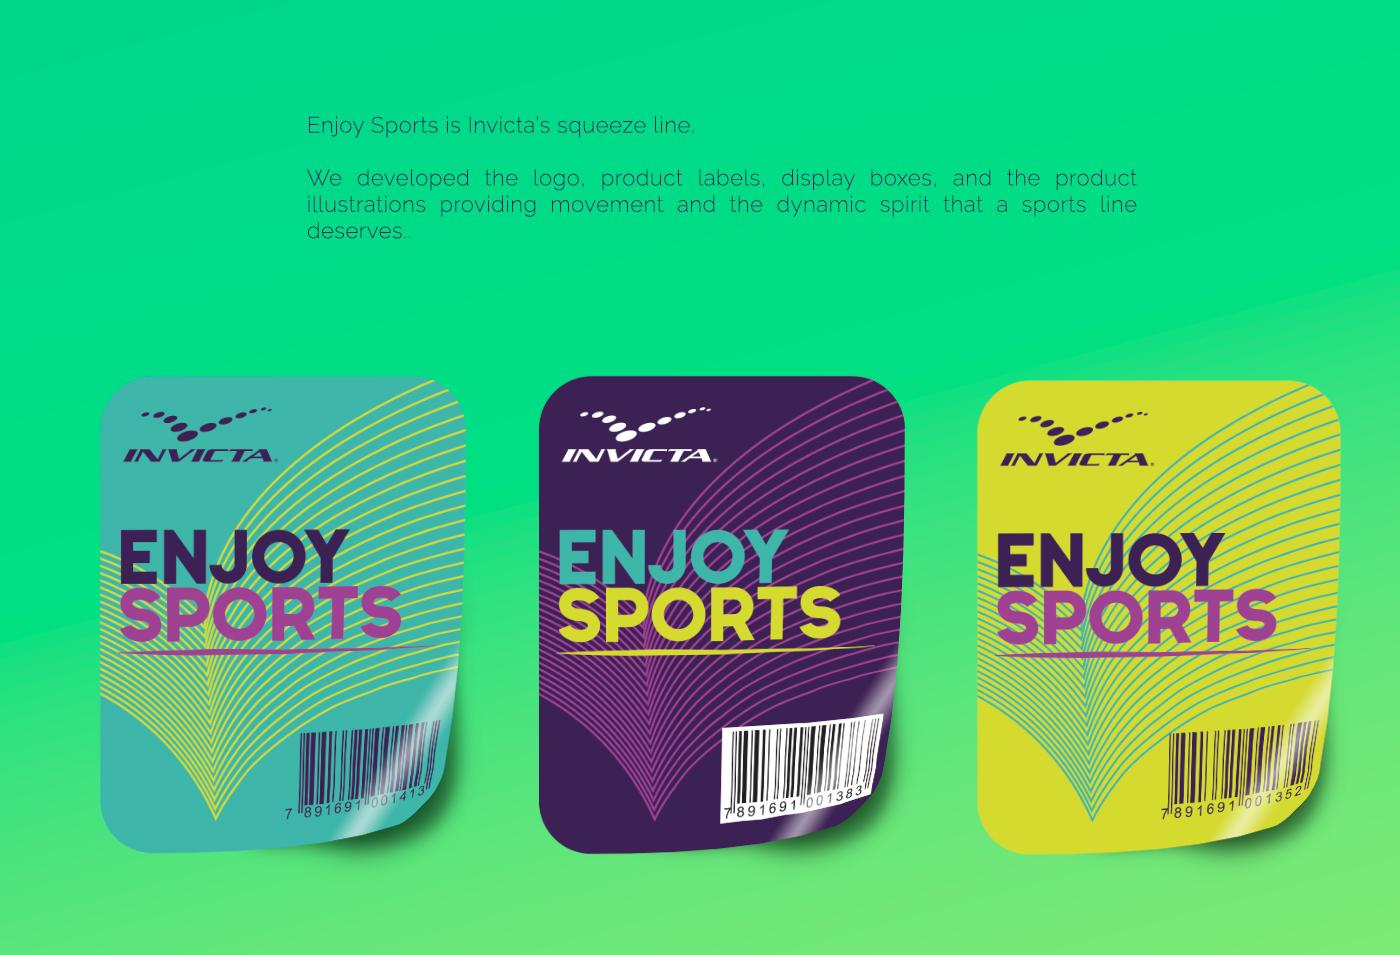 Etiquetas Enjoy Sports